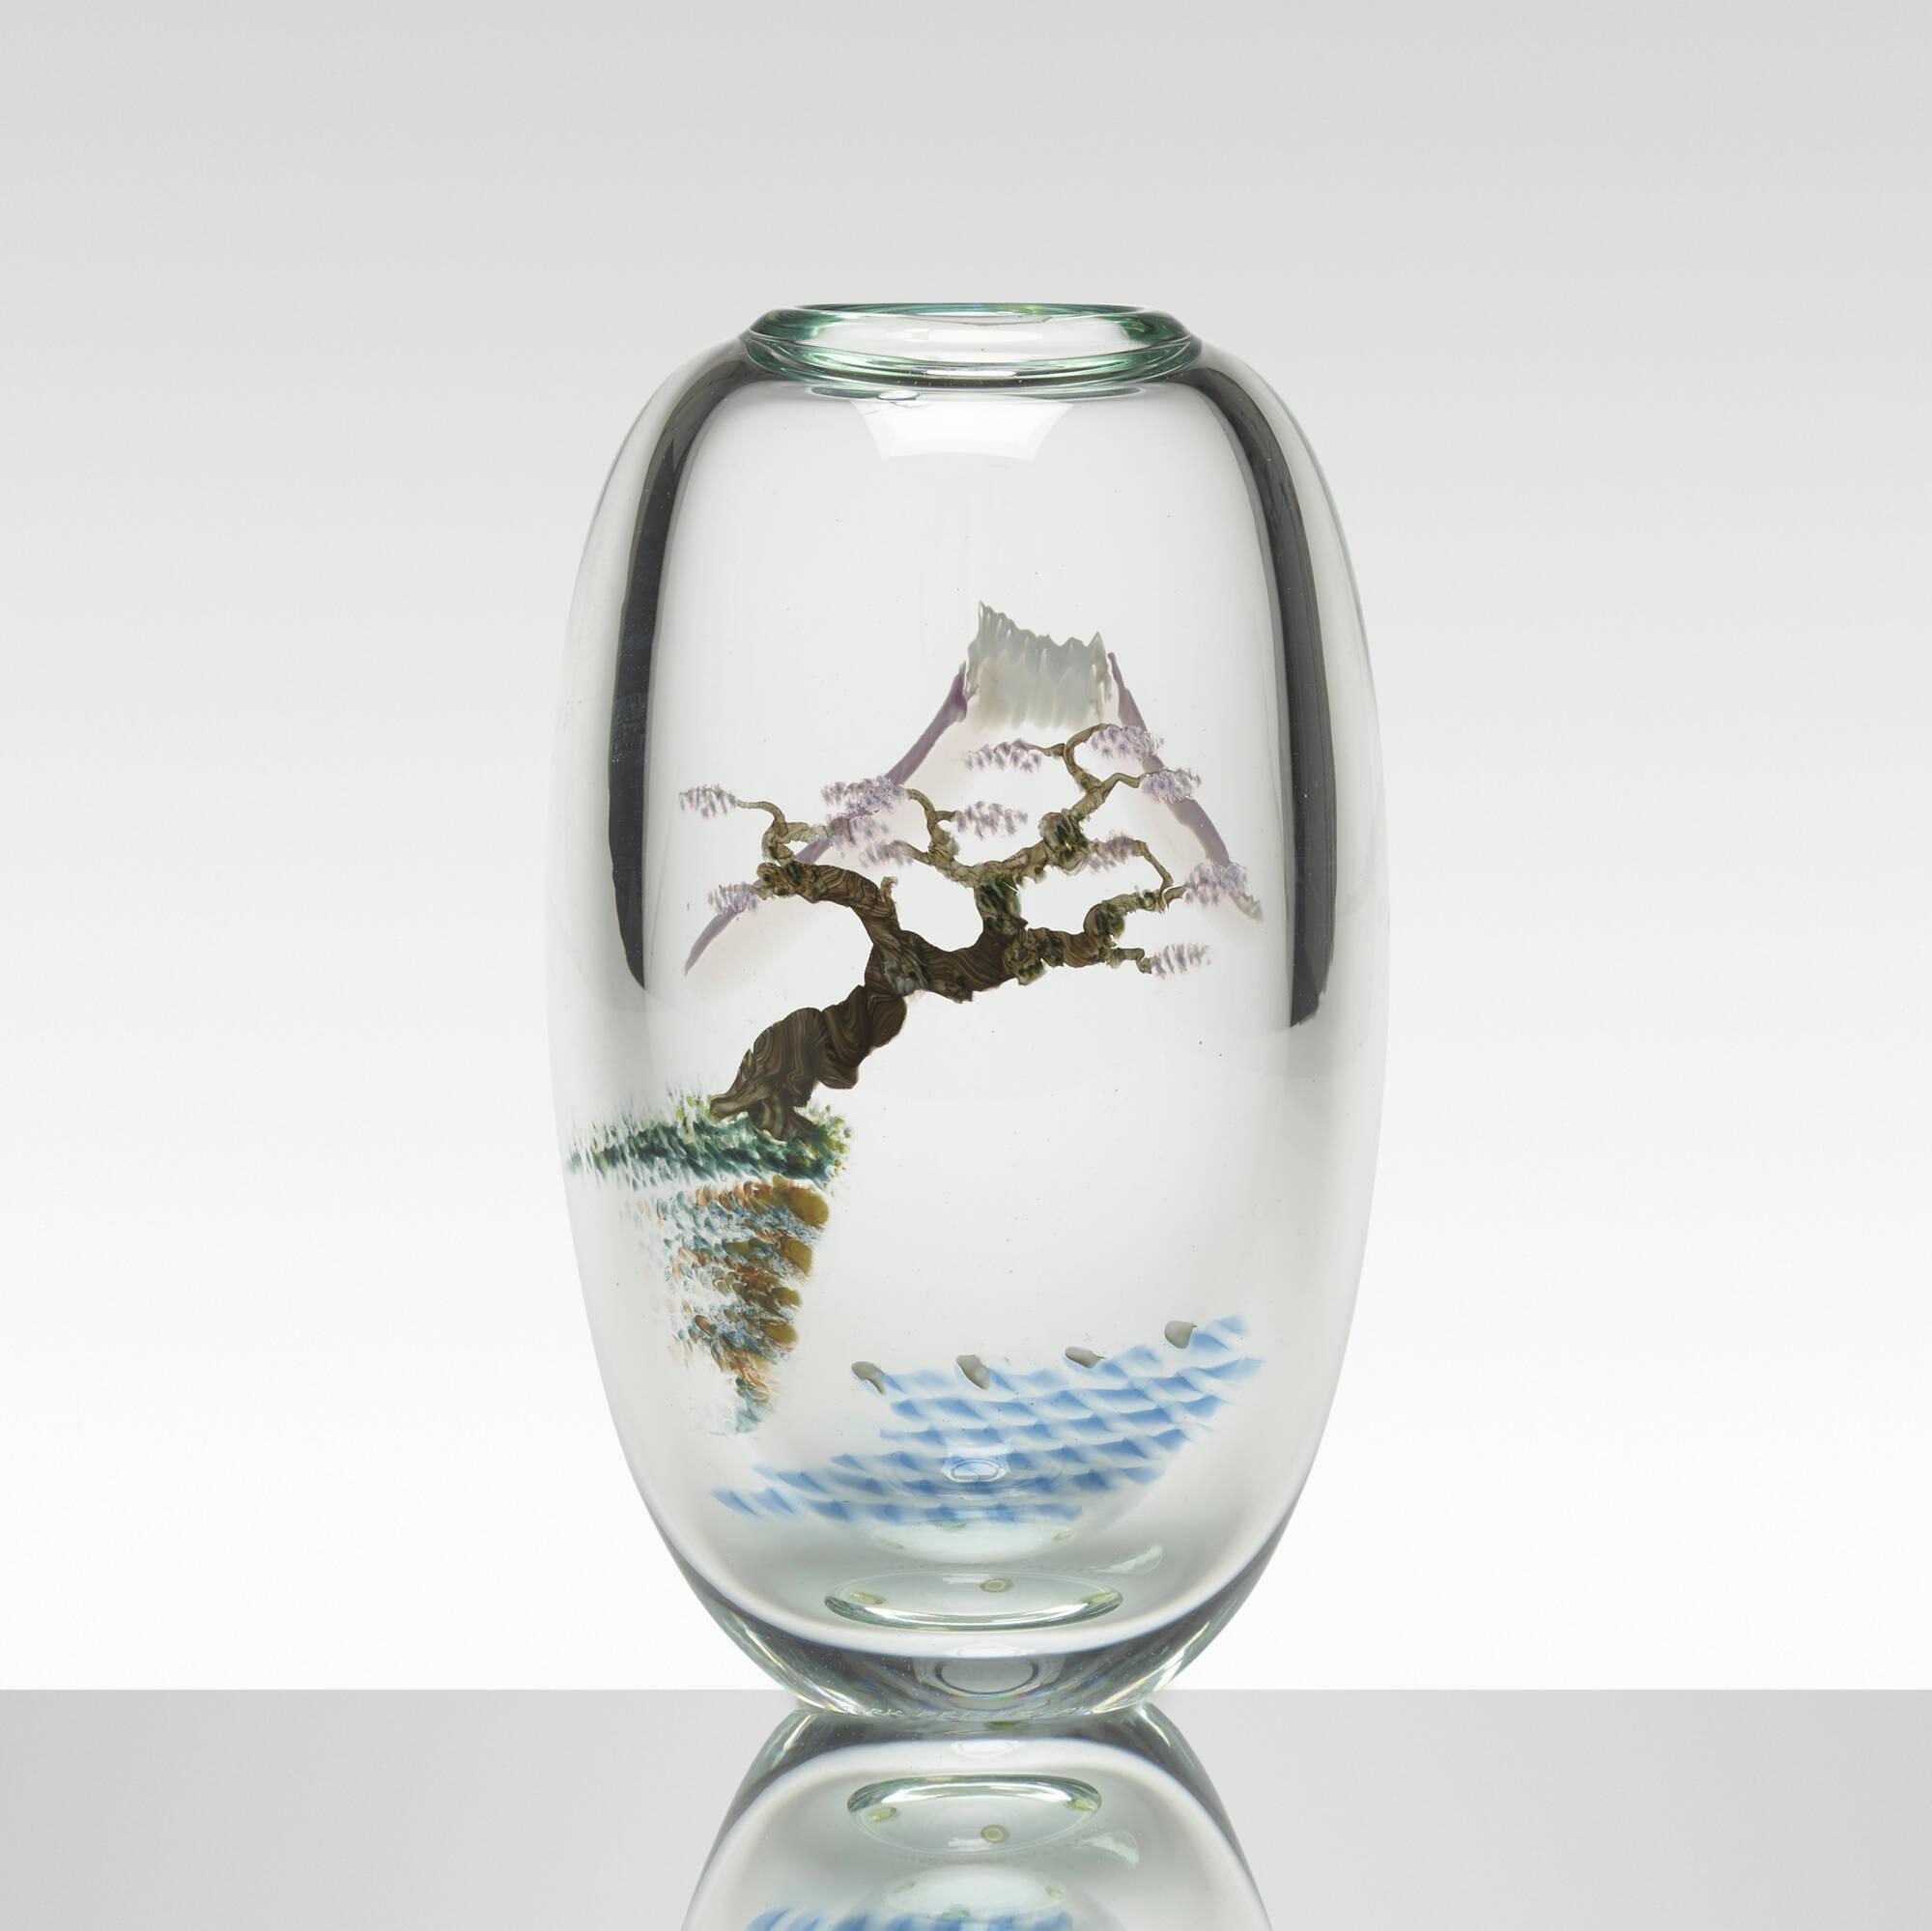 155: Mark Peiser / Plum Tree, Fuji Stream (1 of 2)